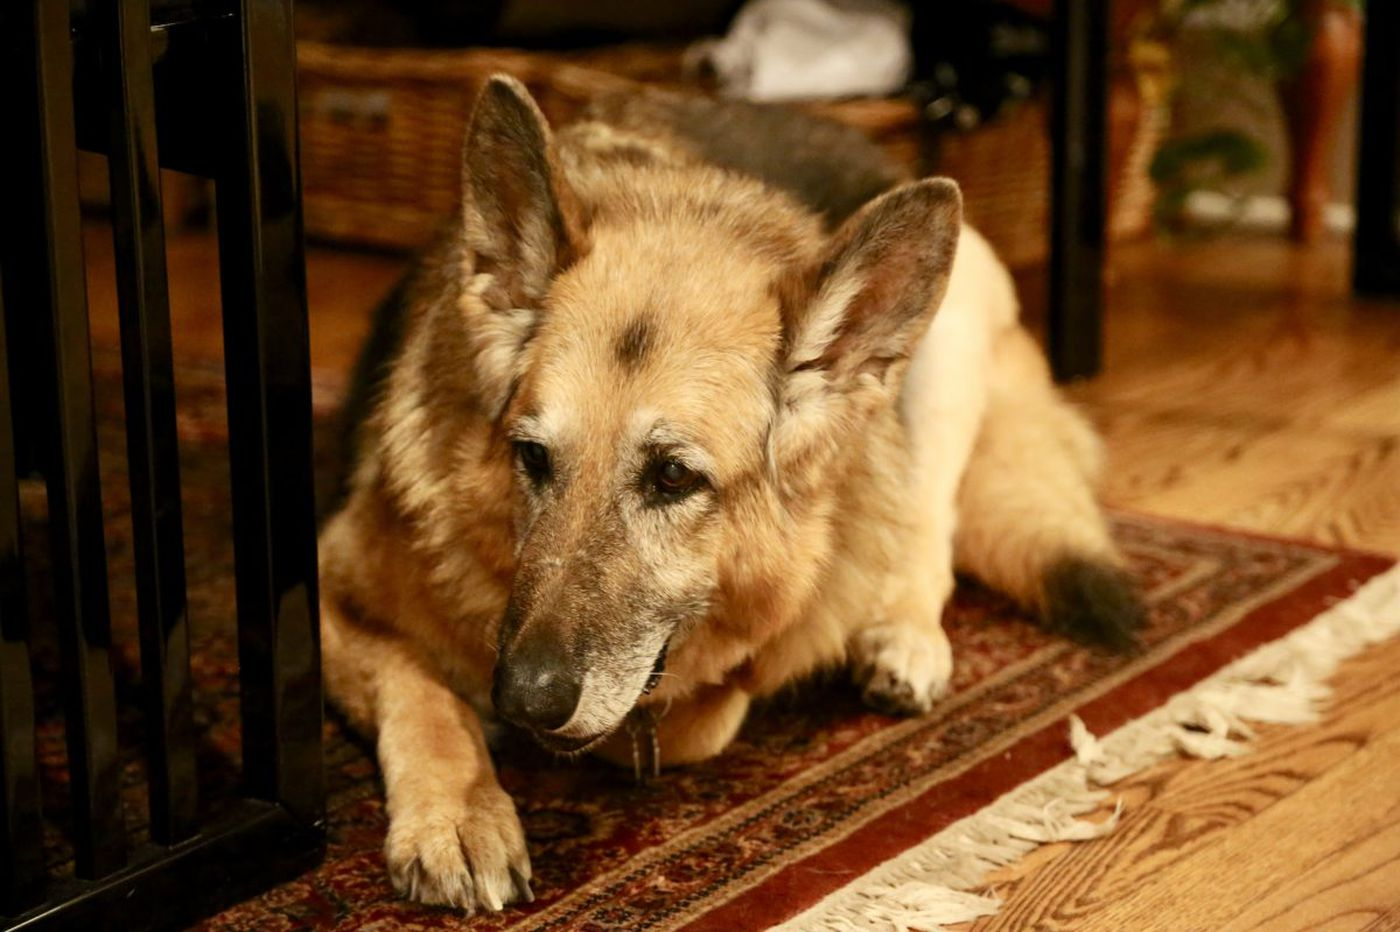 Medical Mystery: Why was German shepherd limping?